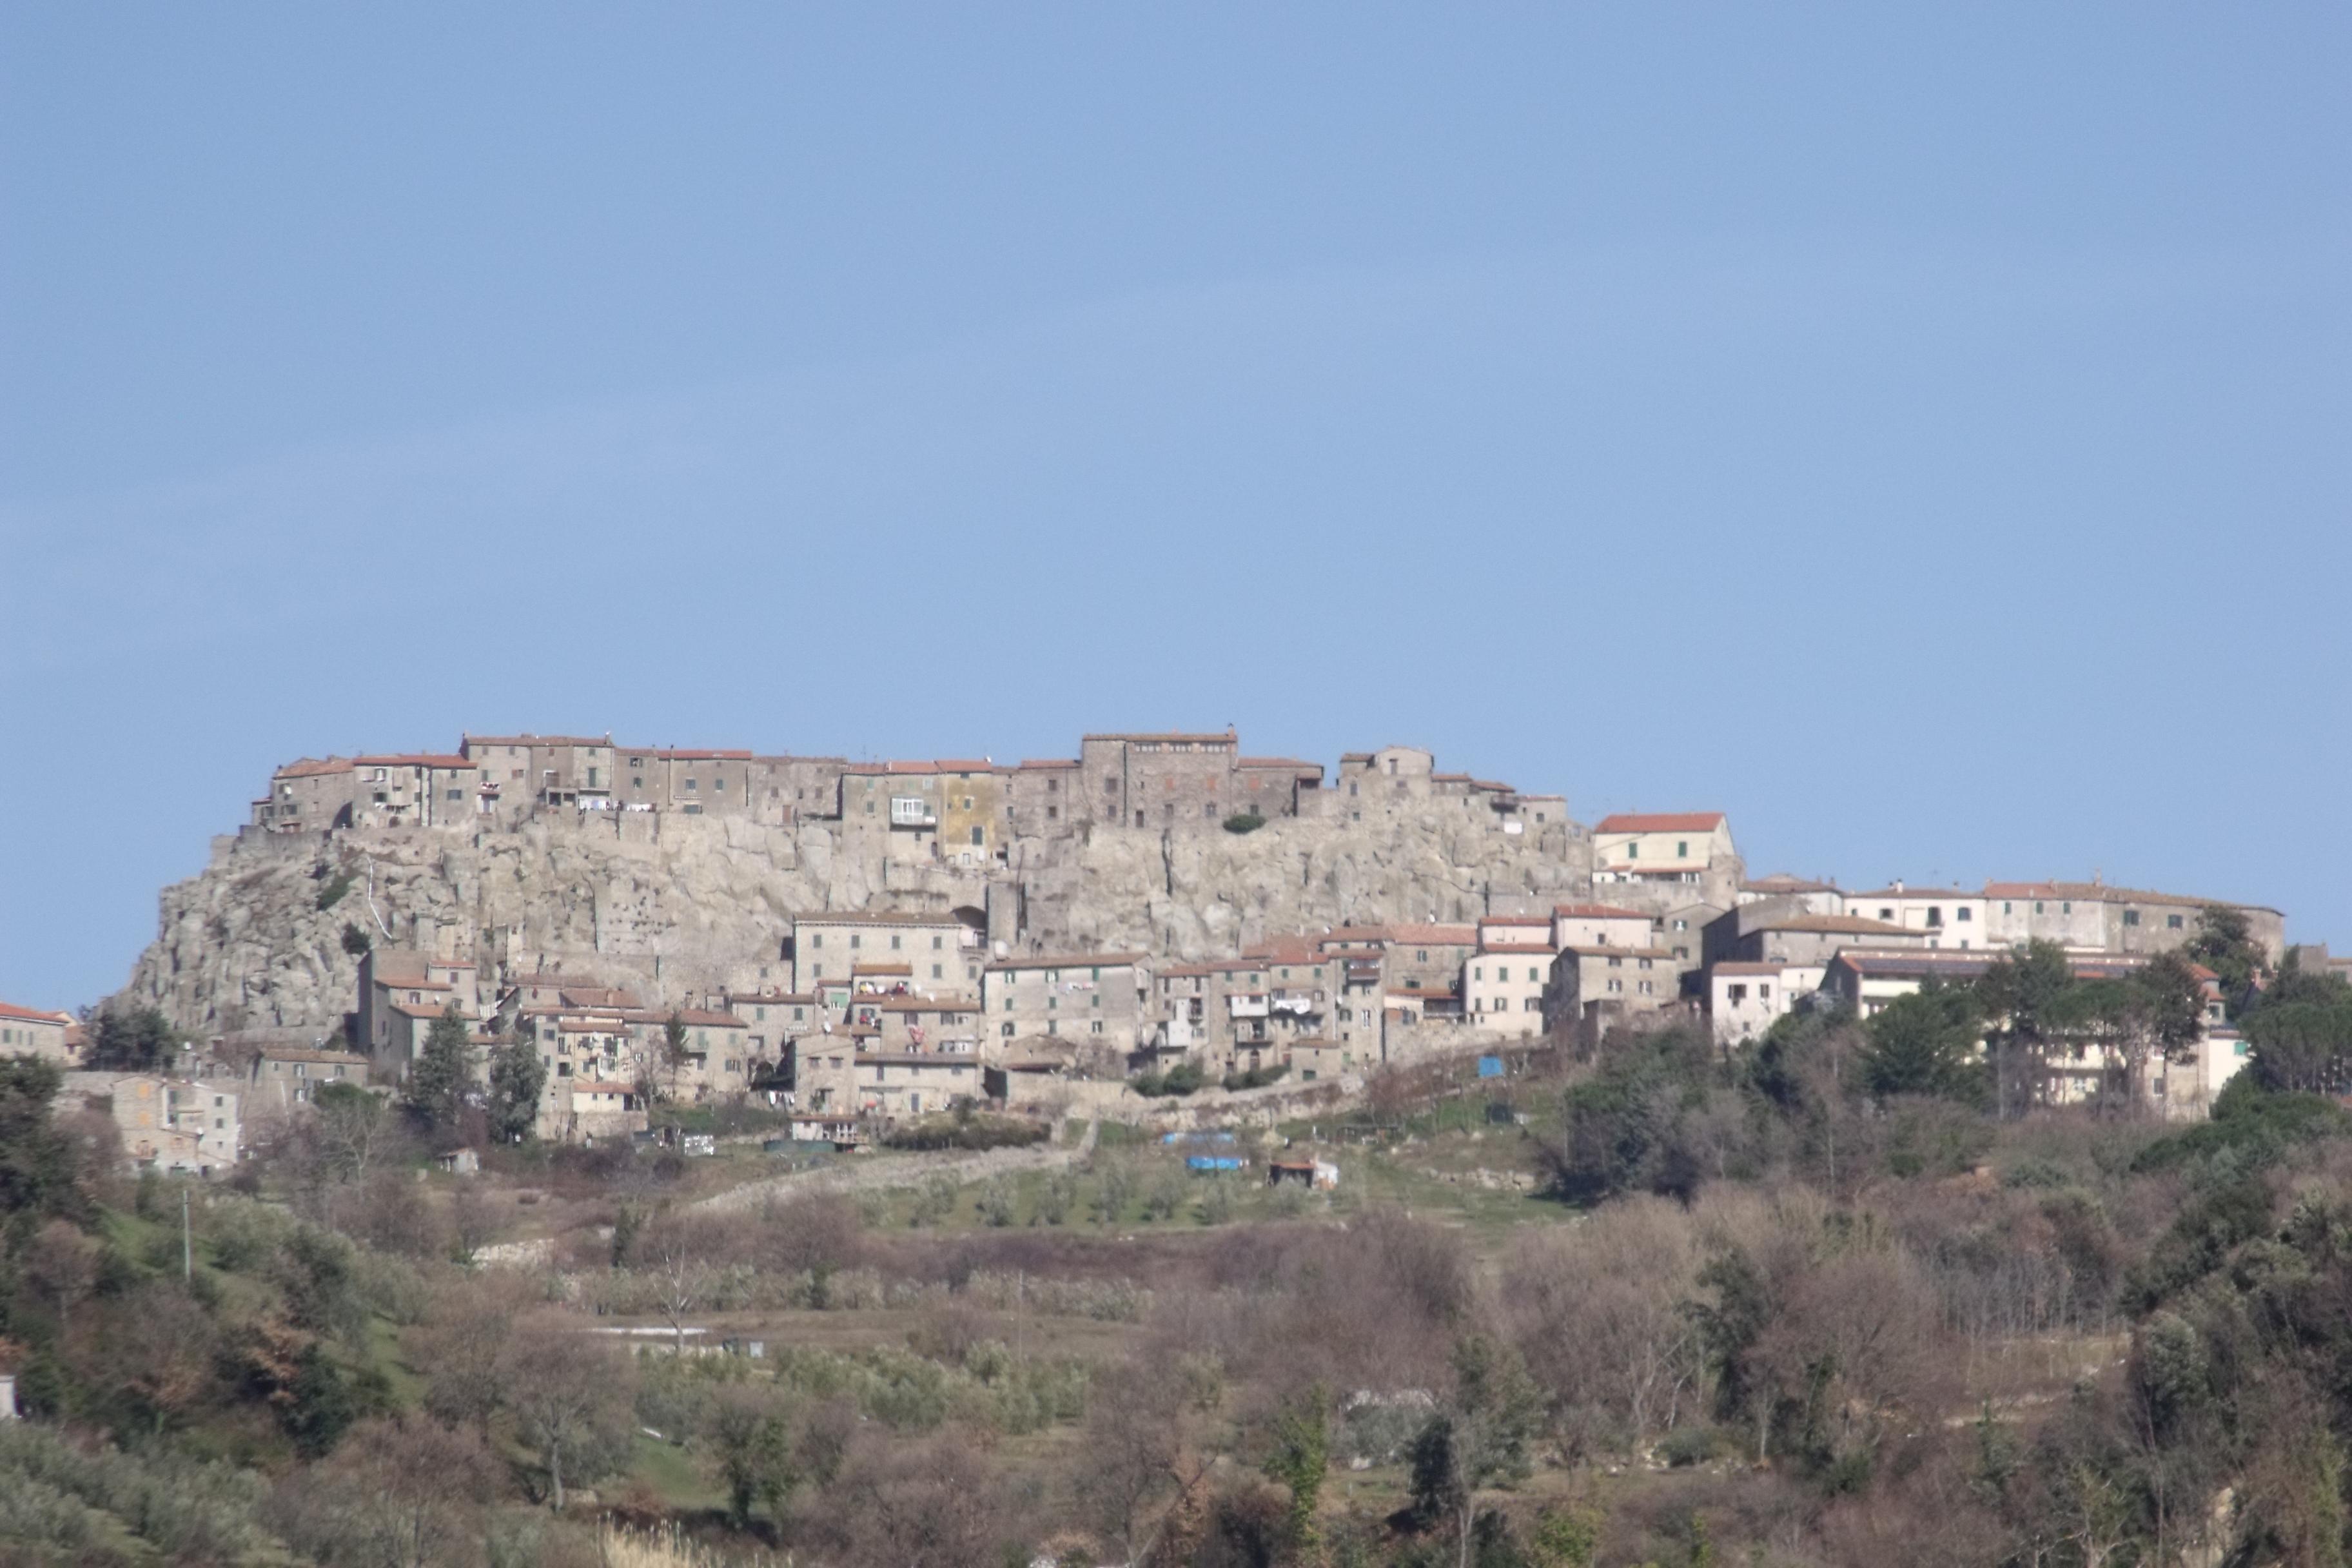 RoccastradaPanorama1.JPG